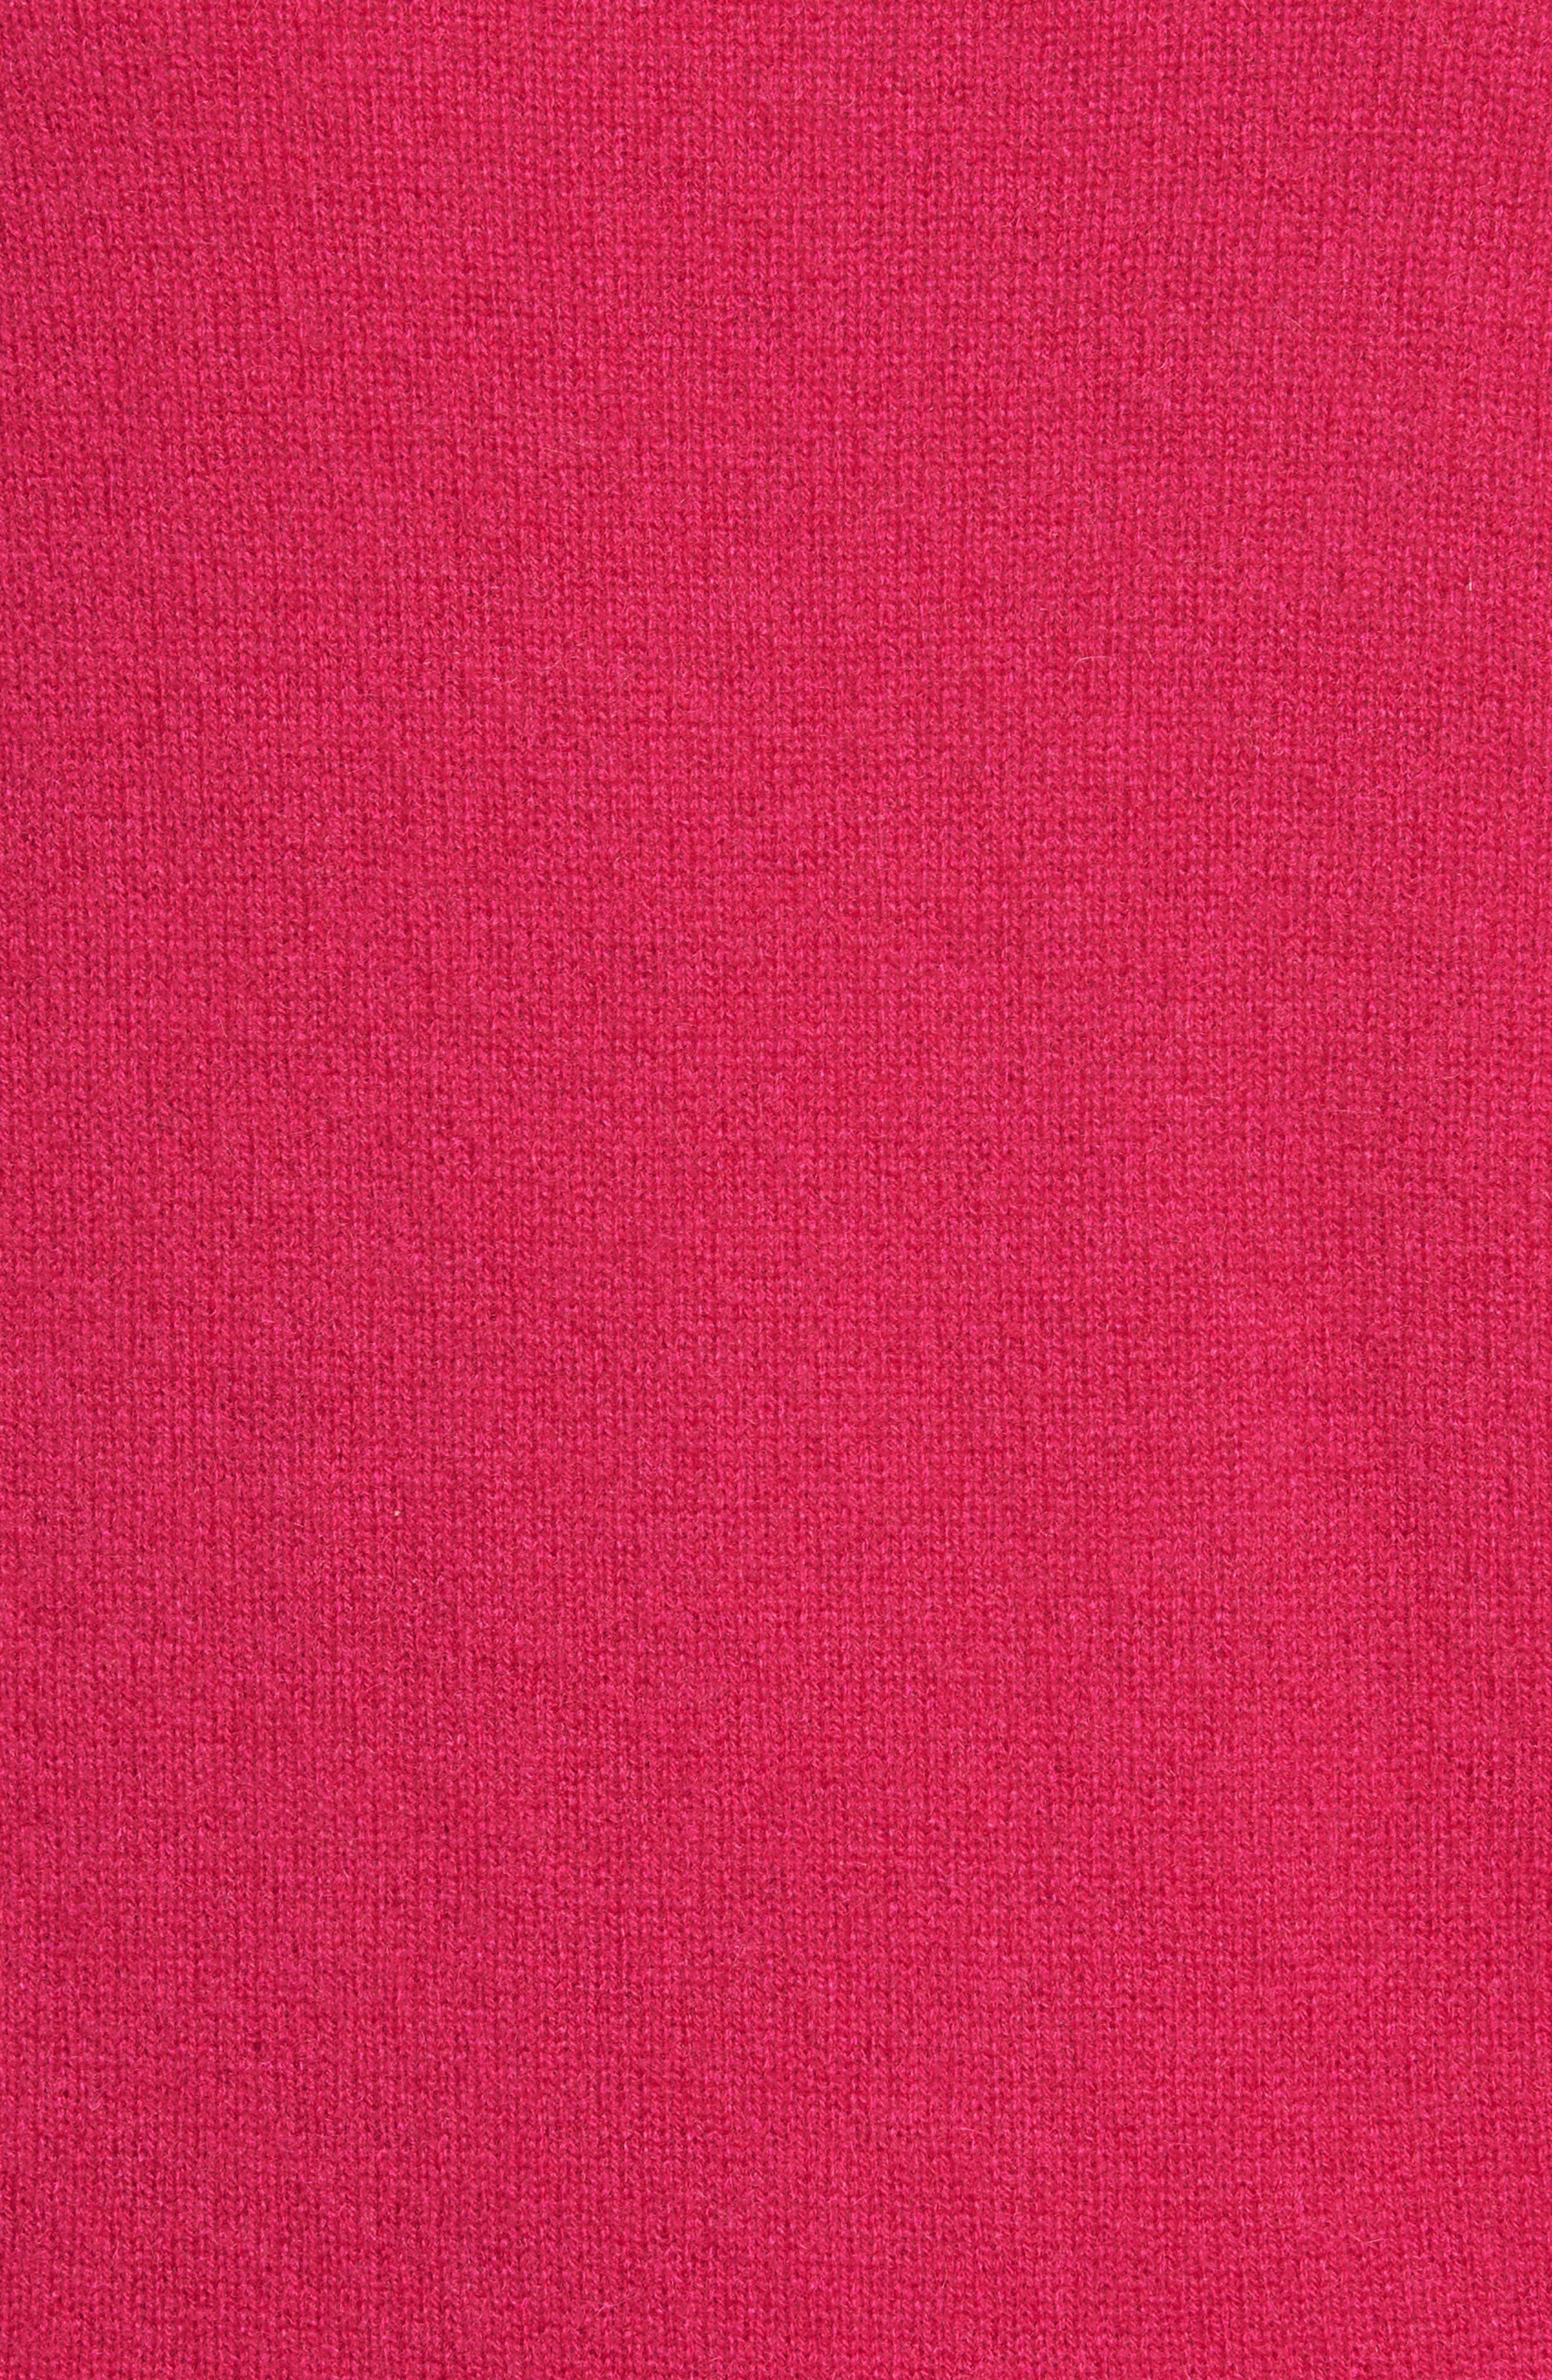 ,                             Crewneck Cashmere Sweater,                             Alternate thumbnail 283, color,                             651